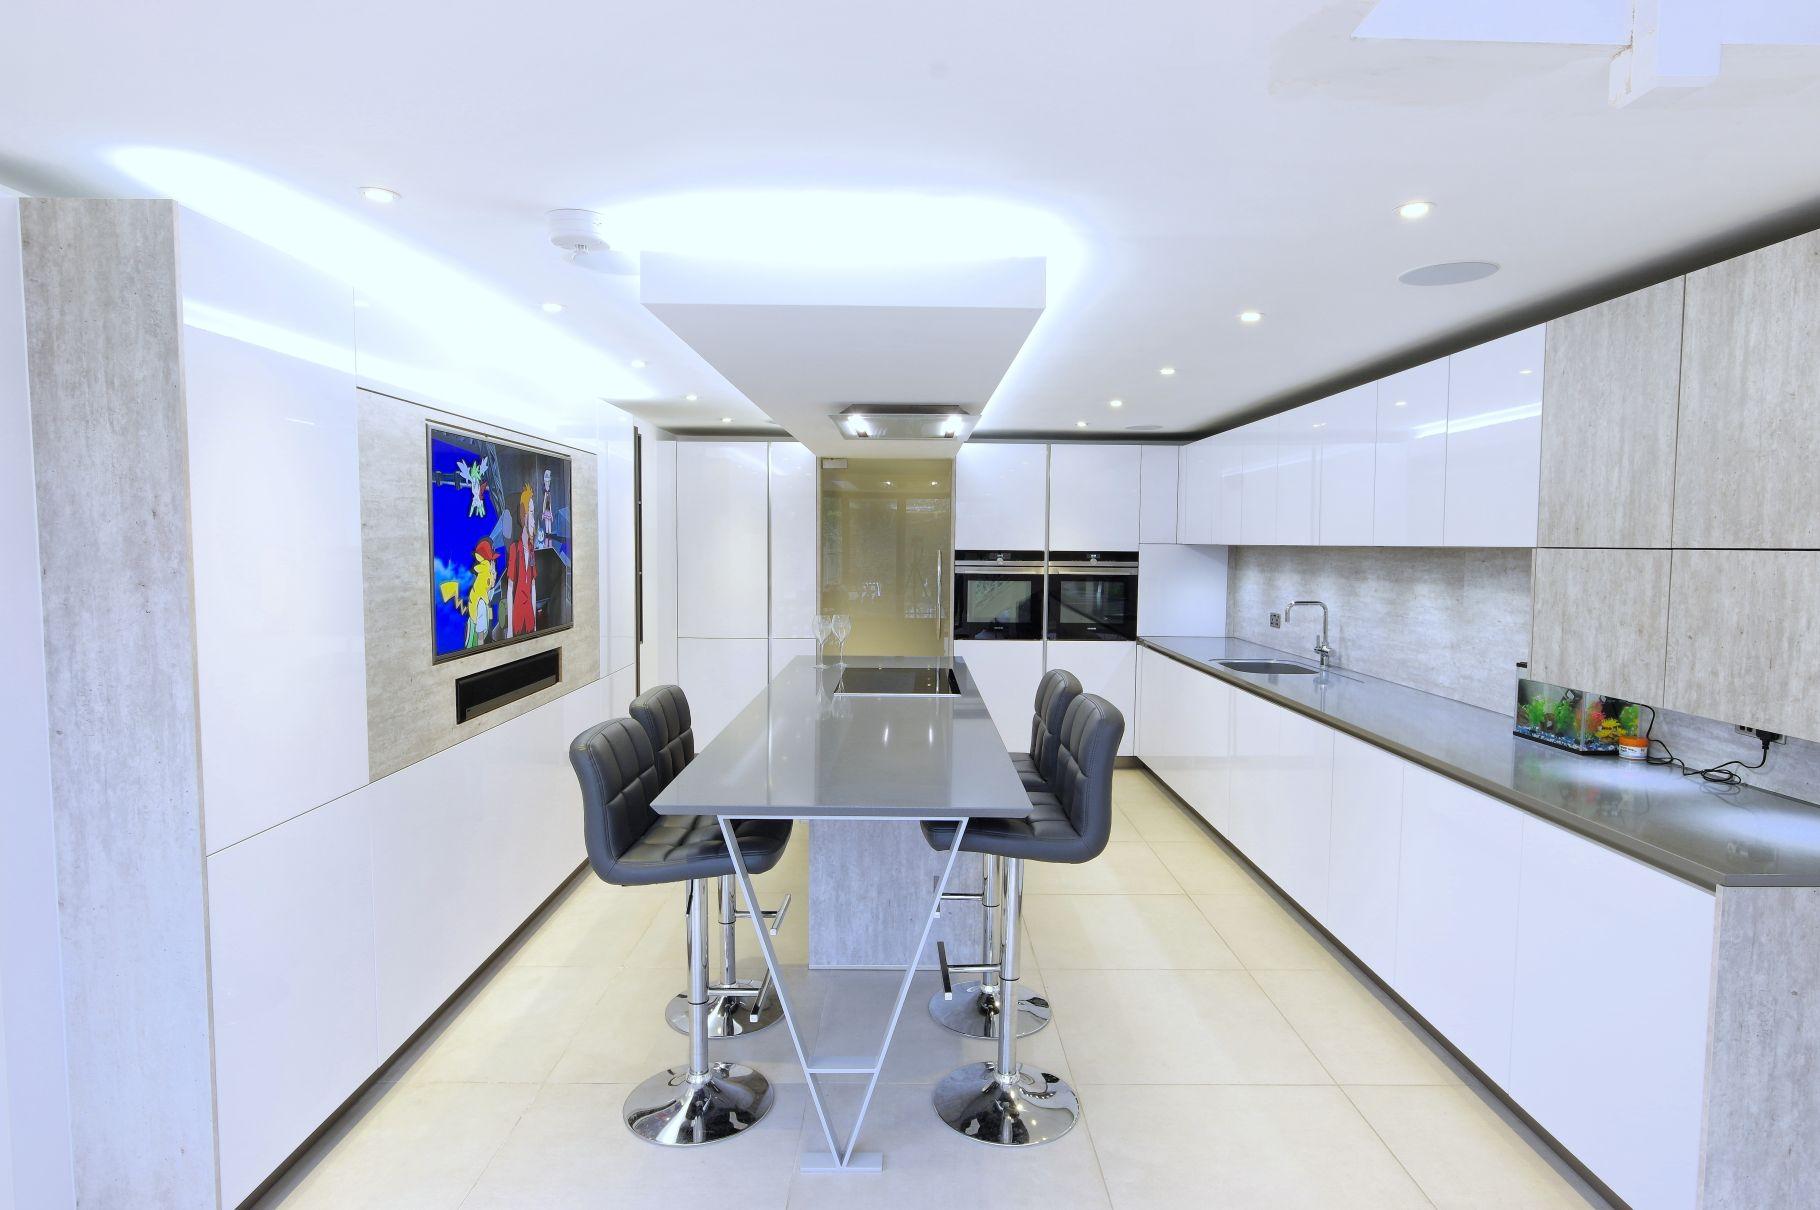 PTC Kitchens Presents A Breathtakingly Stylish Space